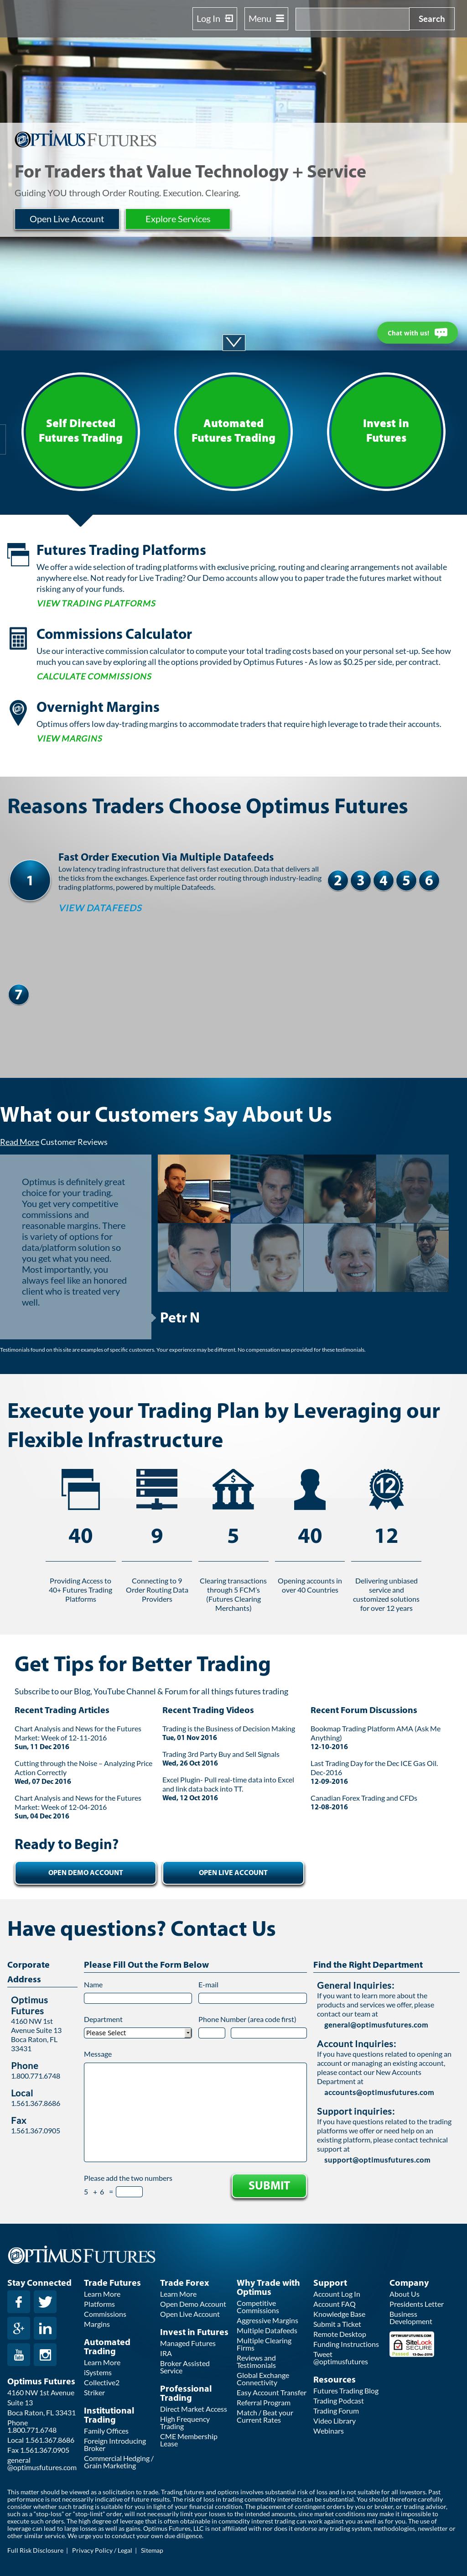 Owler Reports - Optimus Trading Group Blog Rithmic Trader